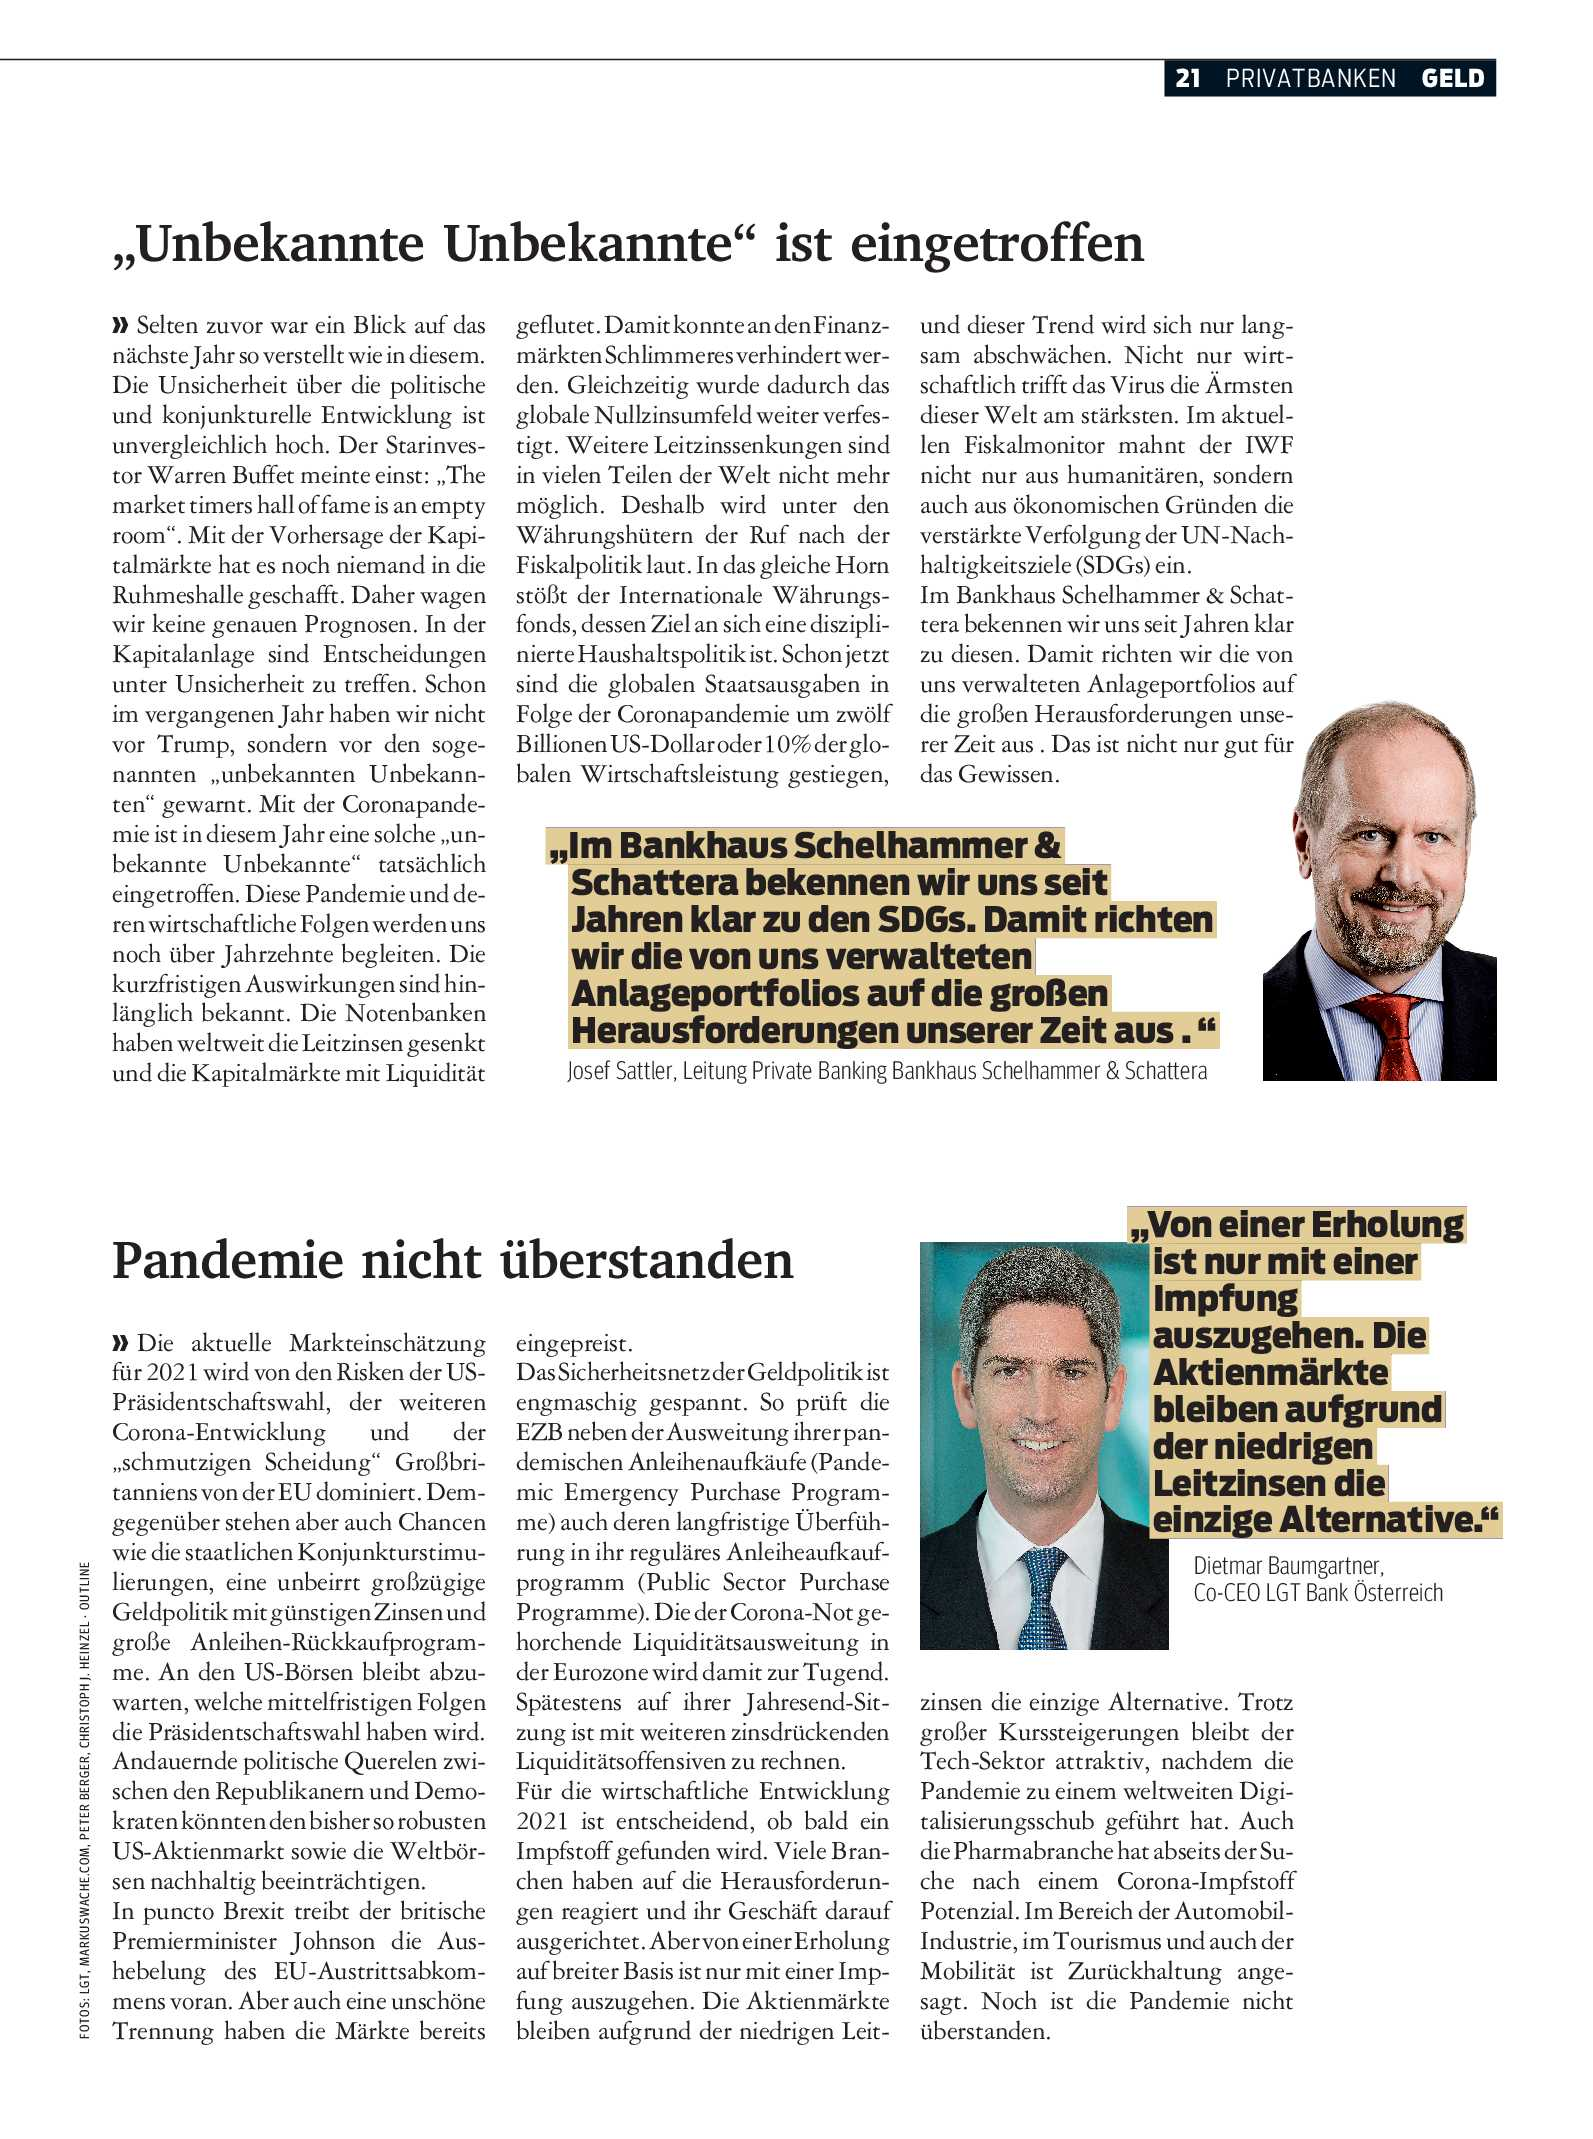 public/epaper/imported/20201118/kurier/magazin/magazin_20201118_021.jpg